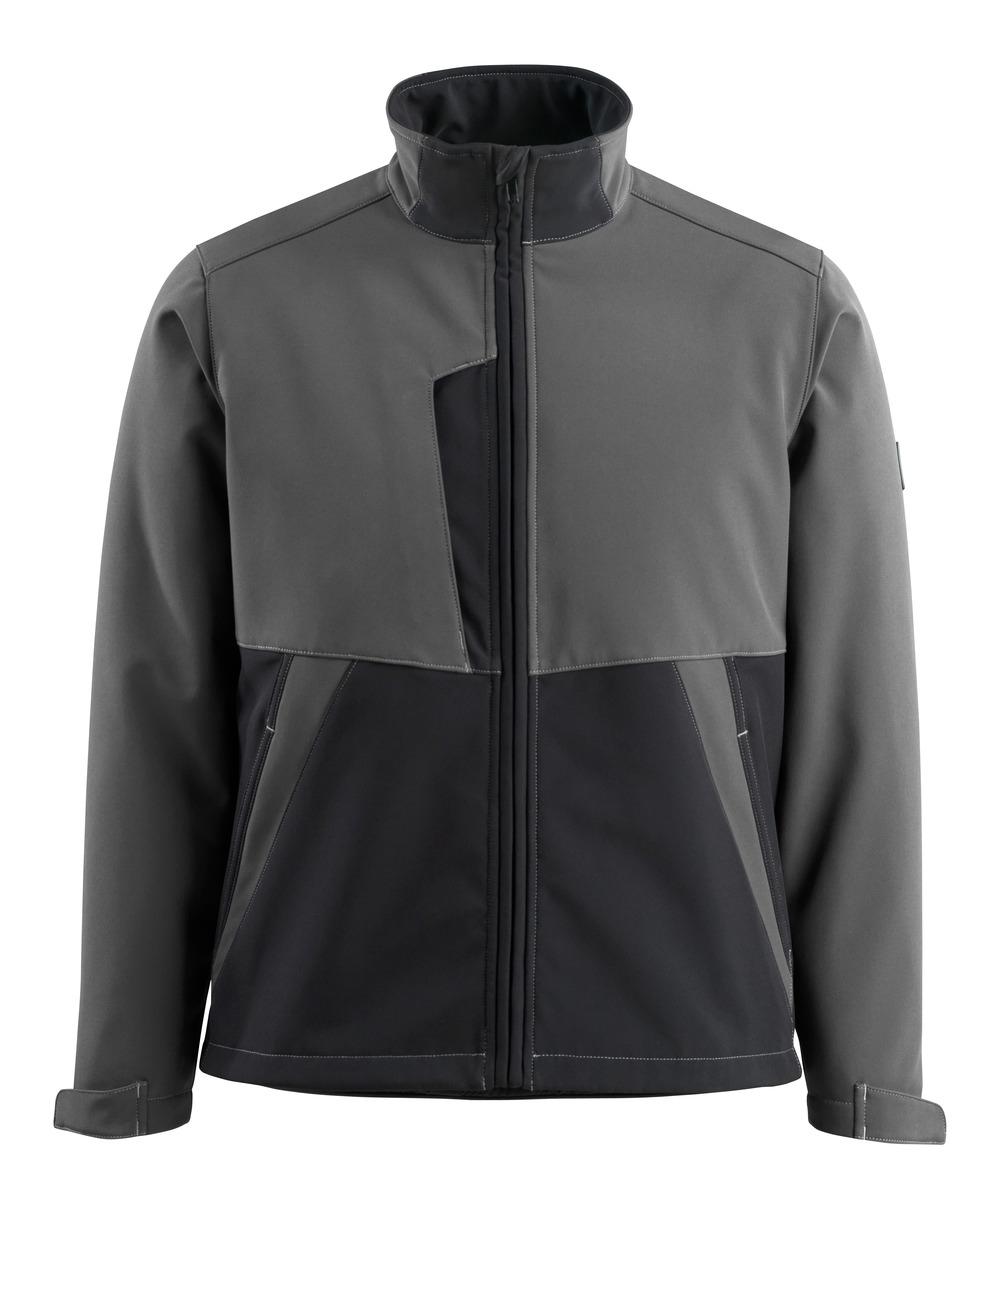 15702-253-1809 Softshell Jacket - dark anthracite/black